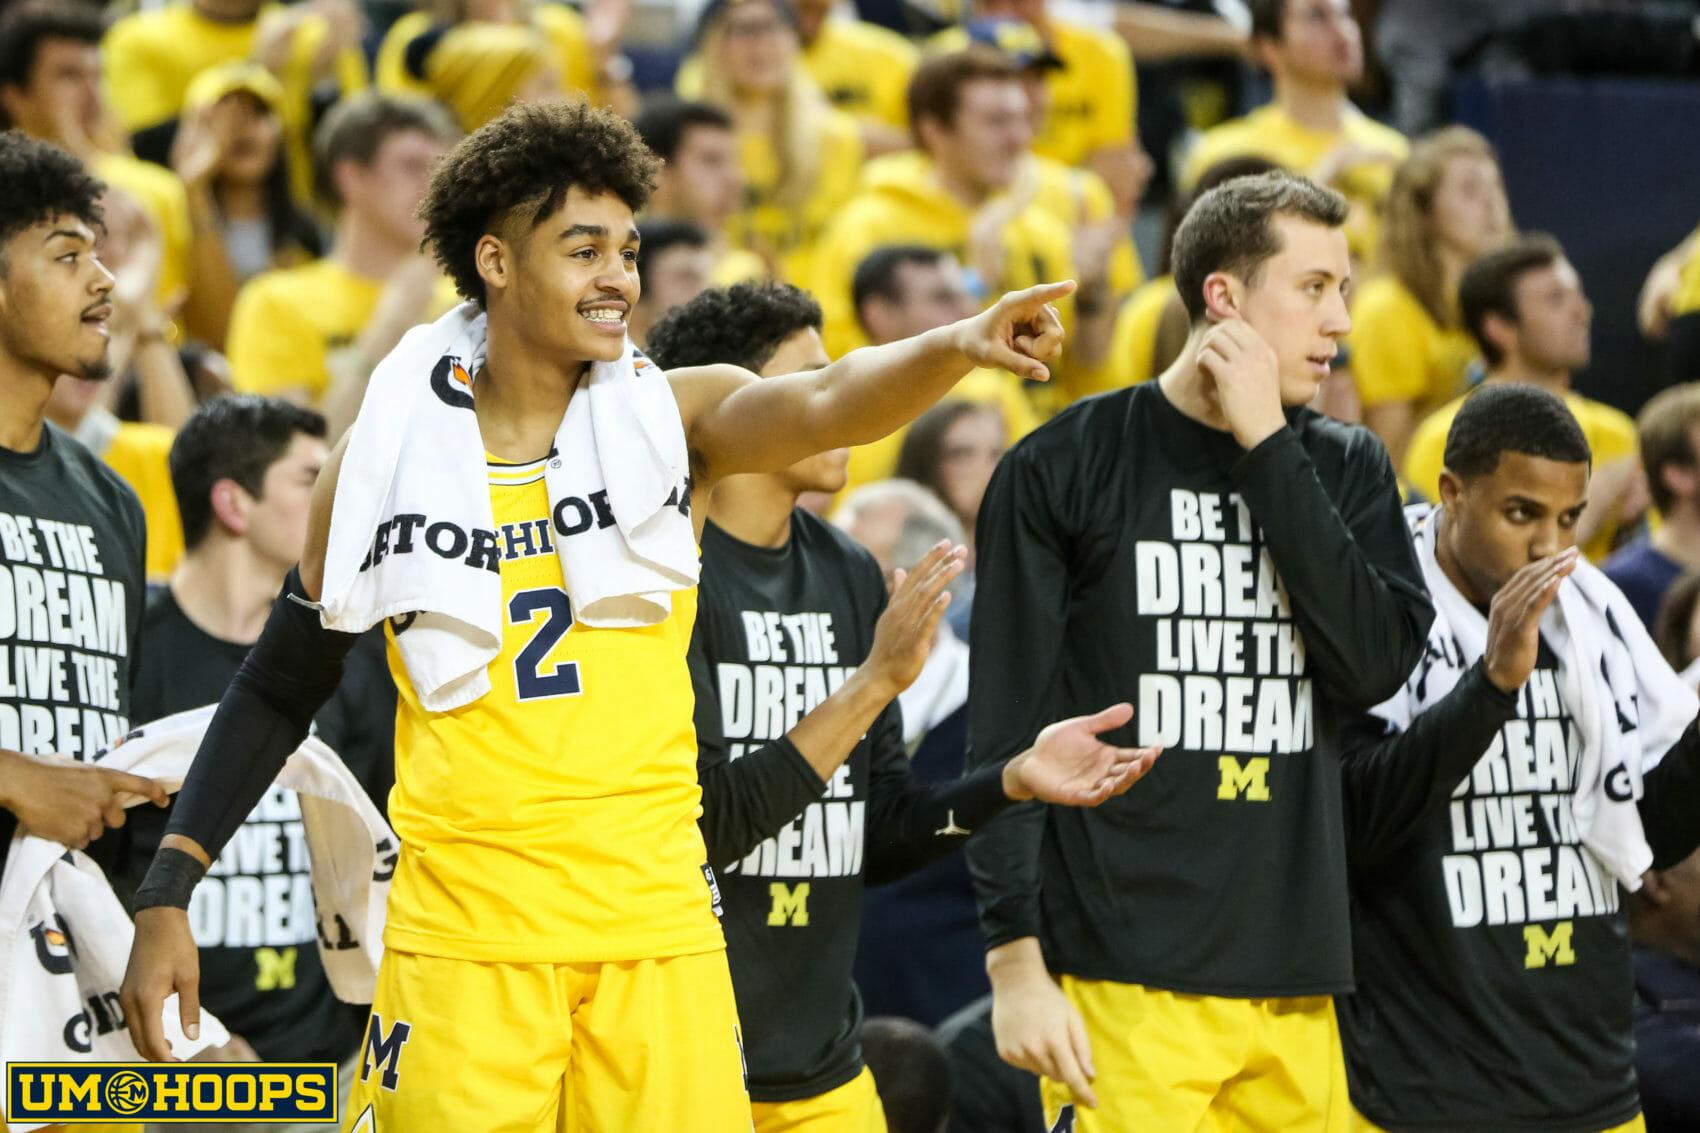 Michigan Announces 2018 19 Basketball Schedule Um Hoops Com